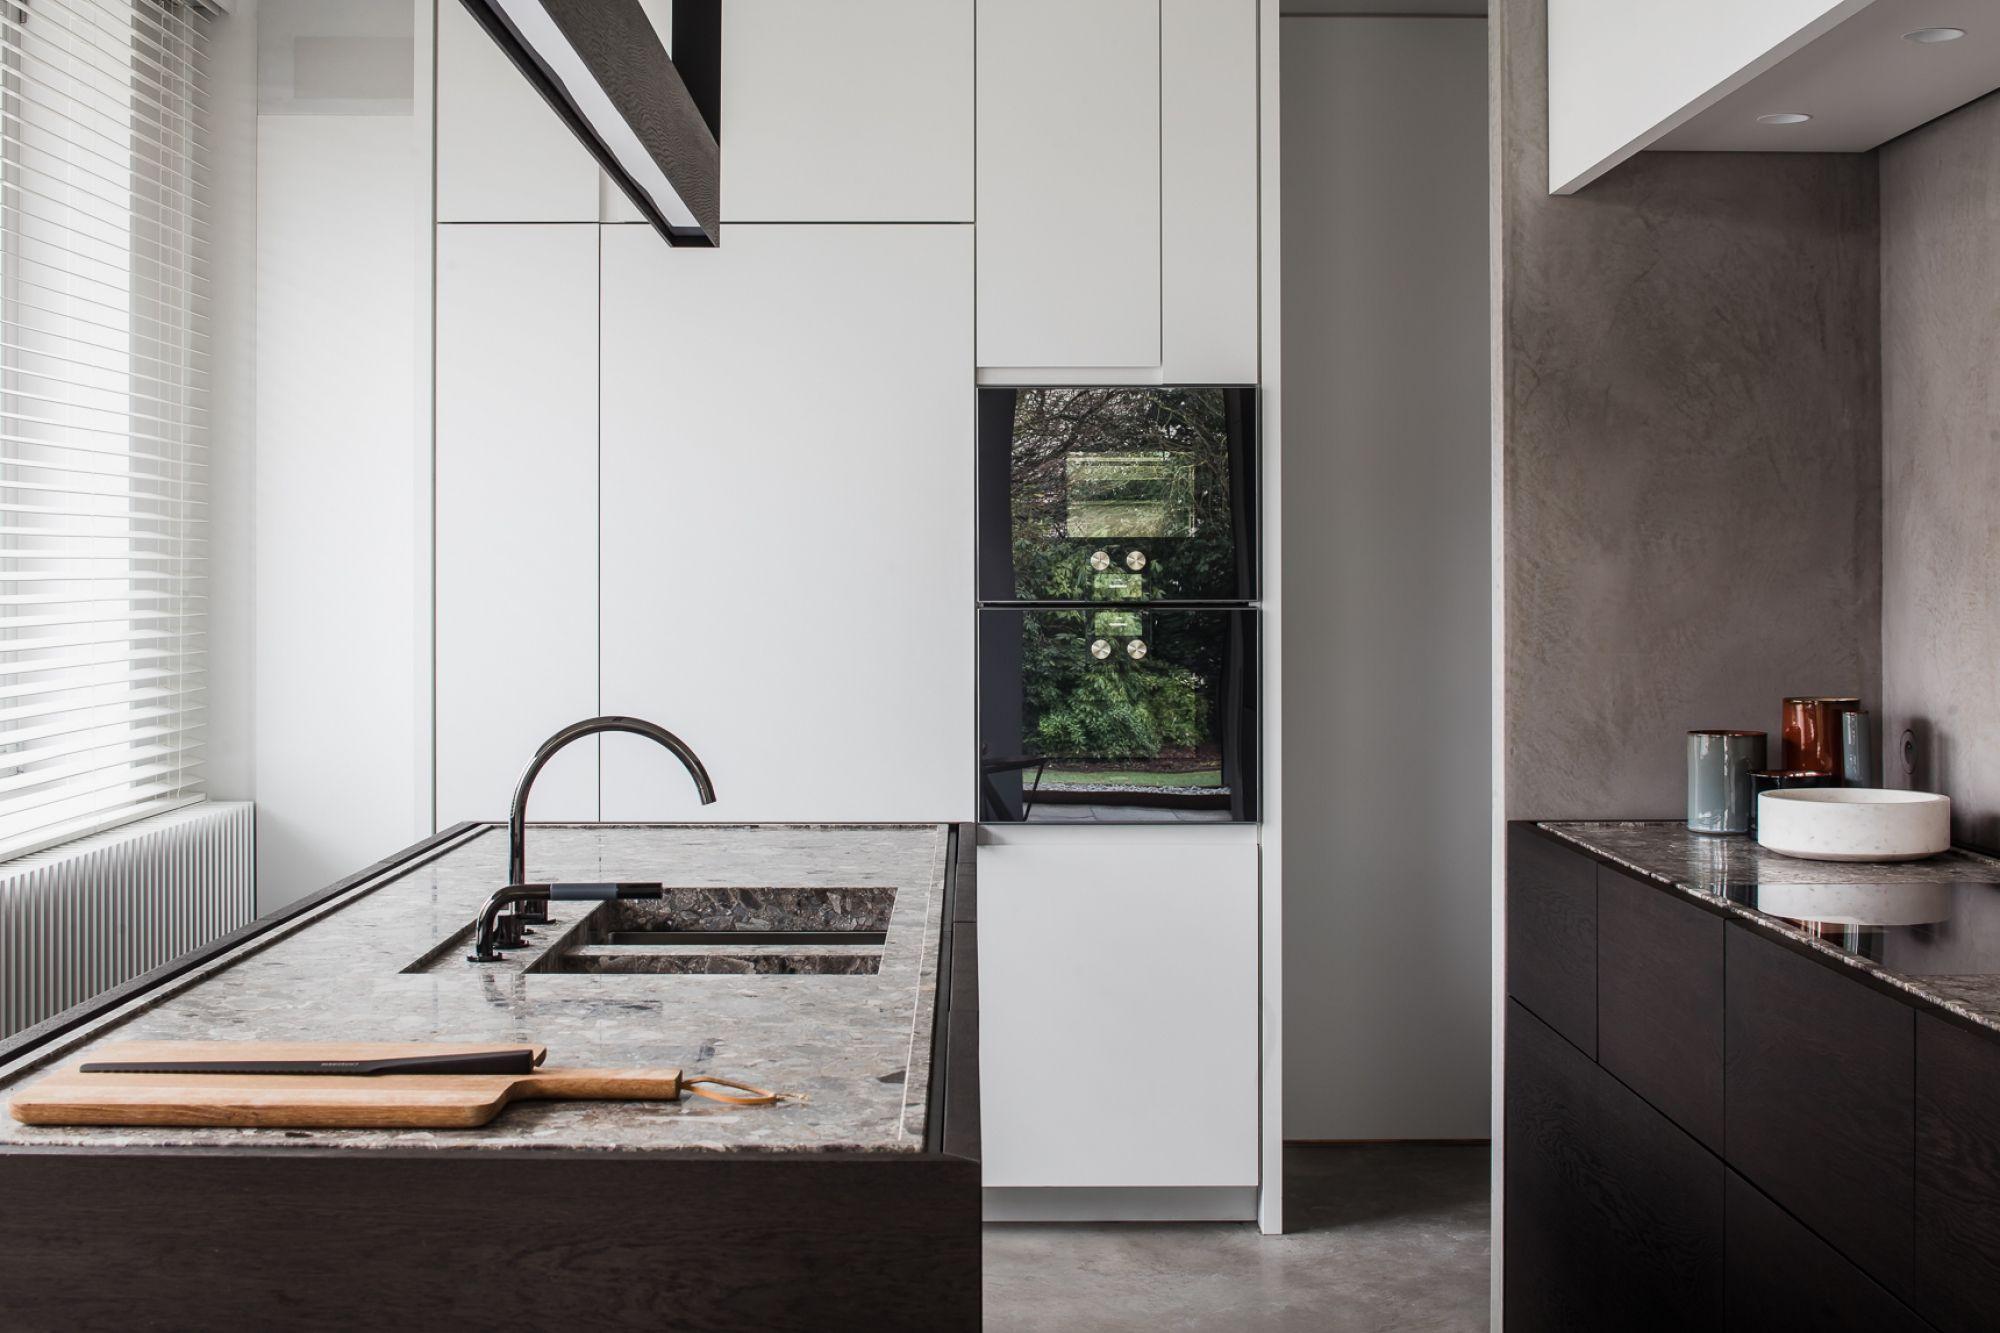 V rumbeke projects frederic kielemoes interieurarchitect